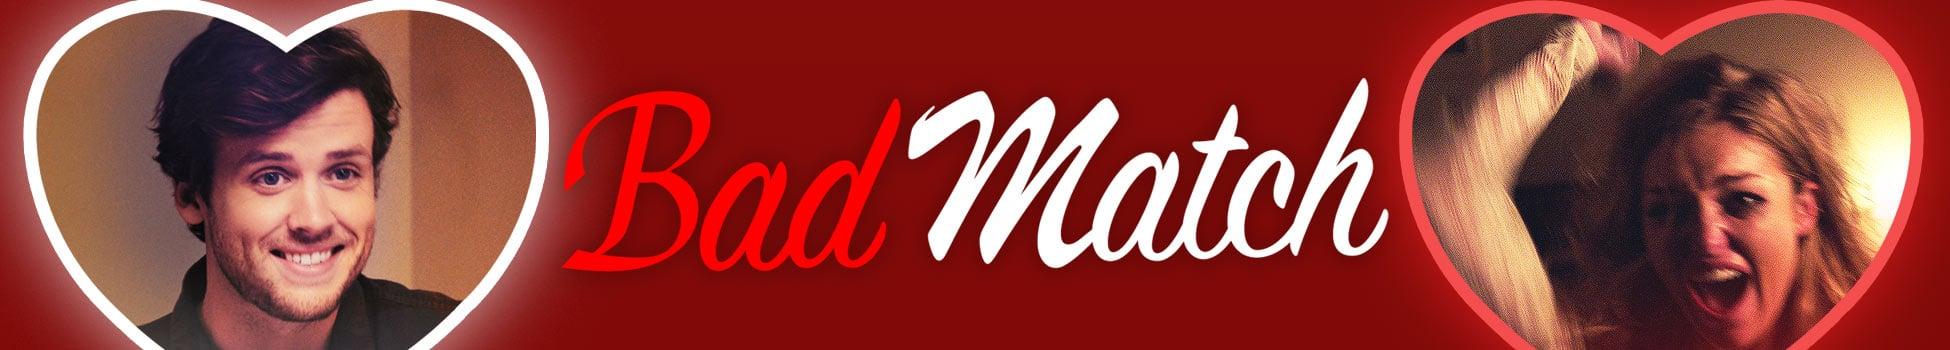 Bad Match - Artwork - Key Visual - Header